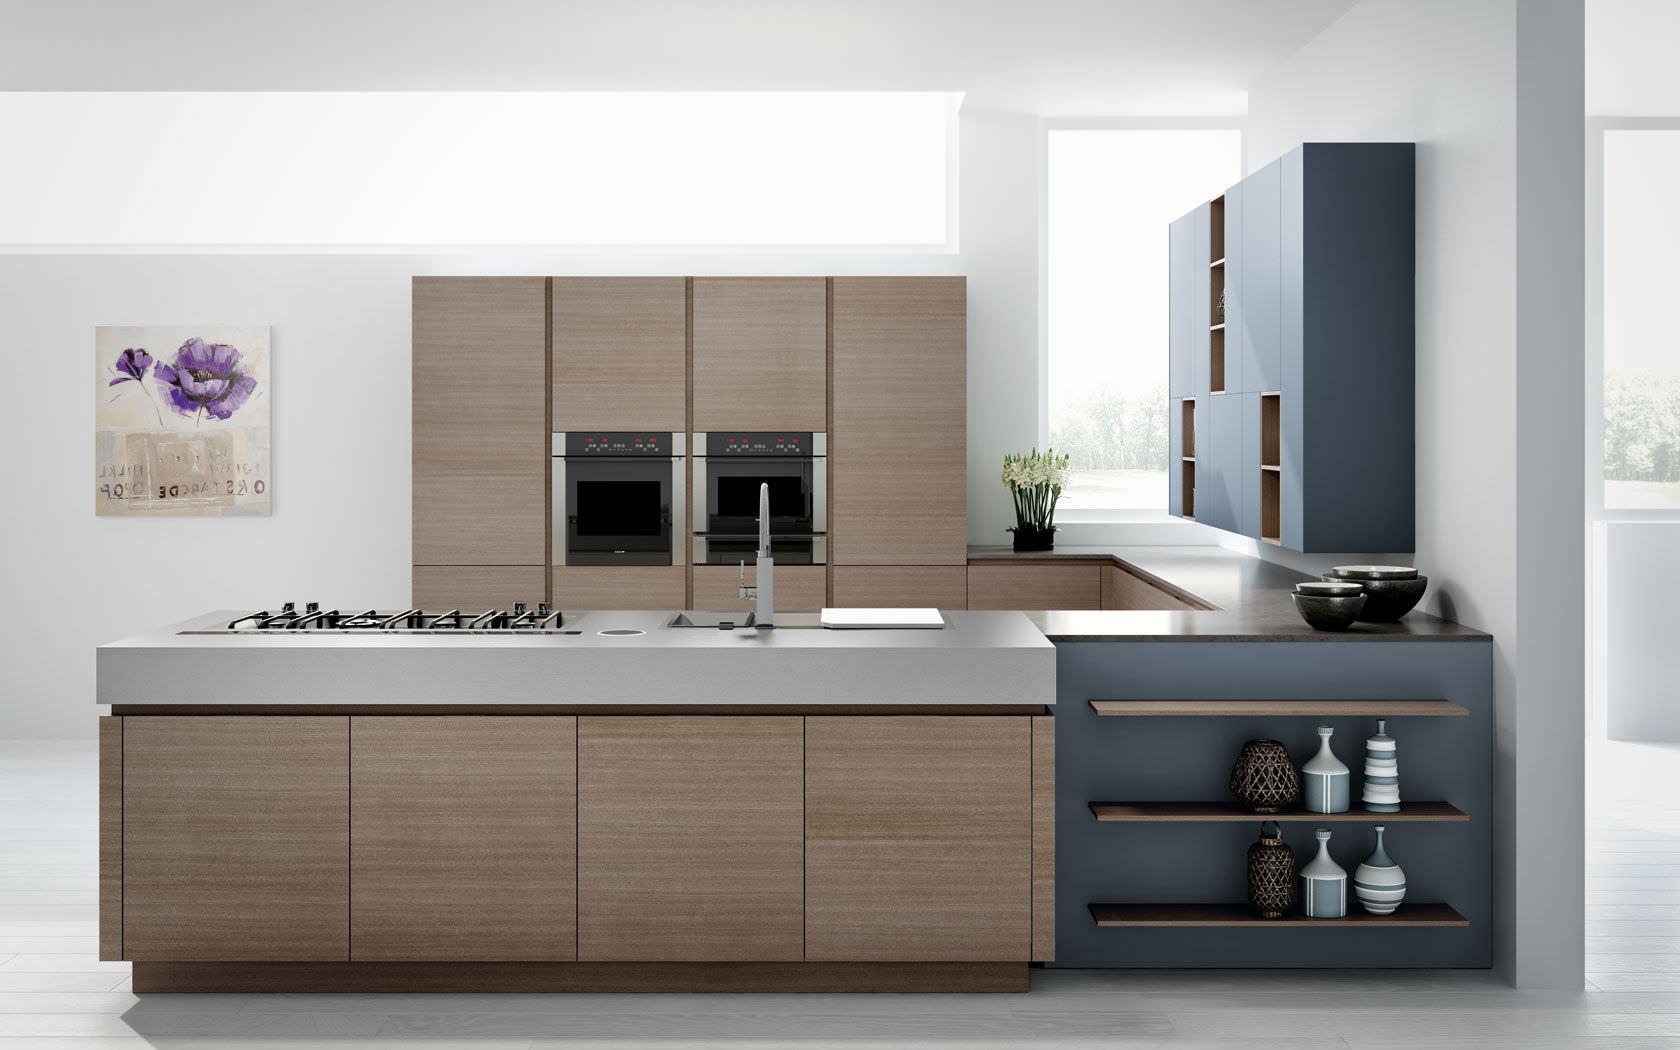 Cucina moderna / impiallacciata in legno - ESSENTHIA ELECTA ...